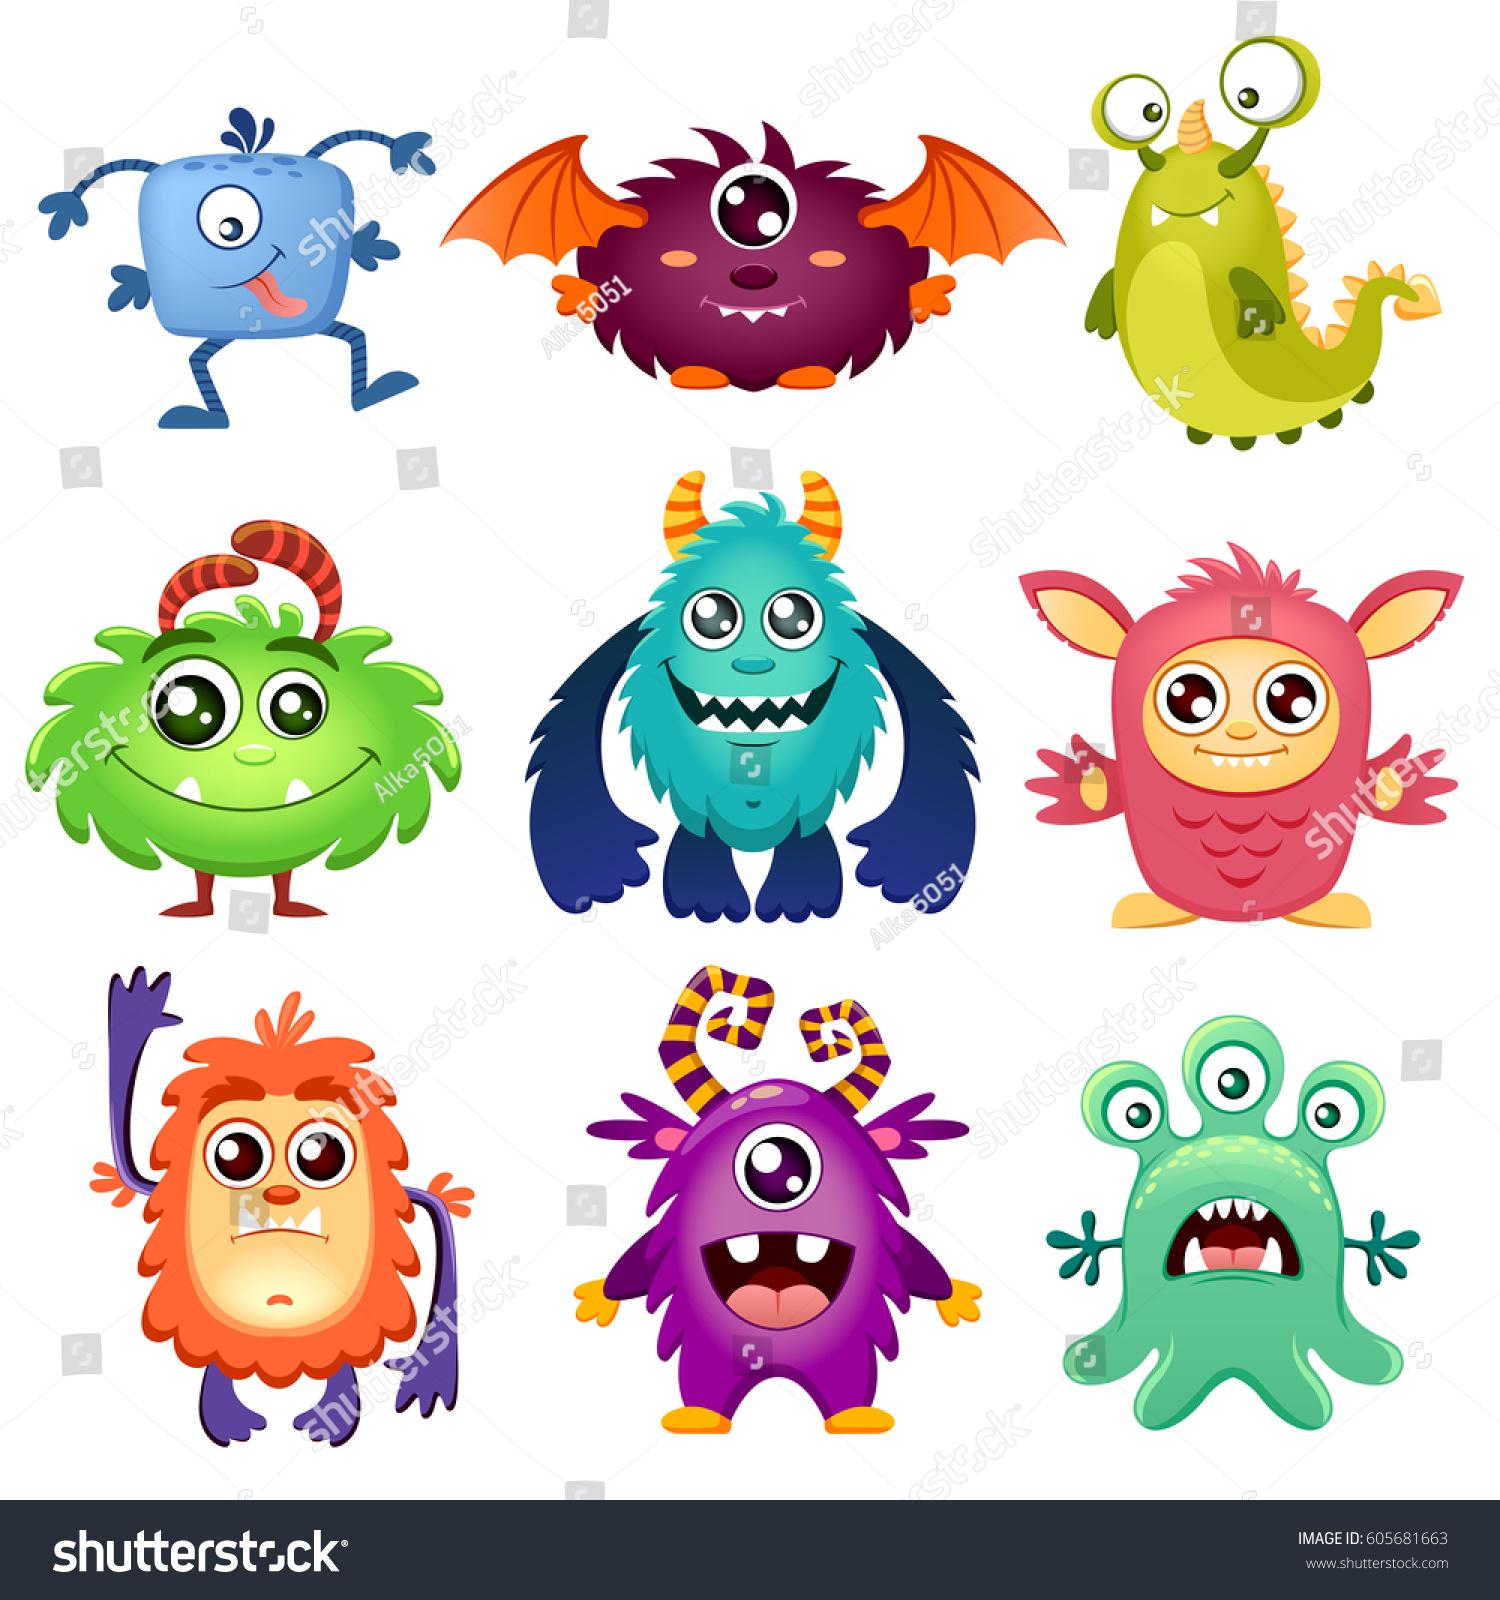 Cute Cartoon Monsters Stock Vector